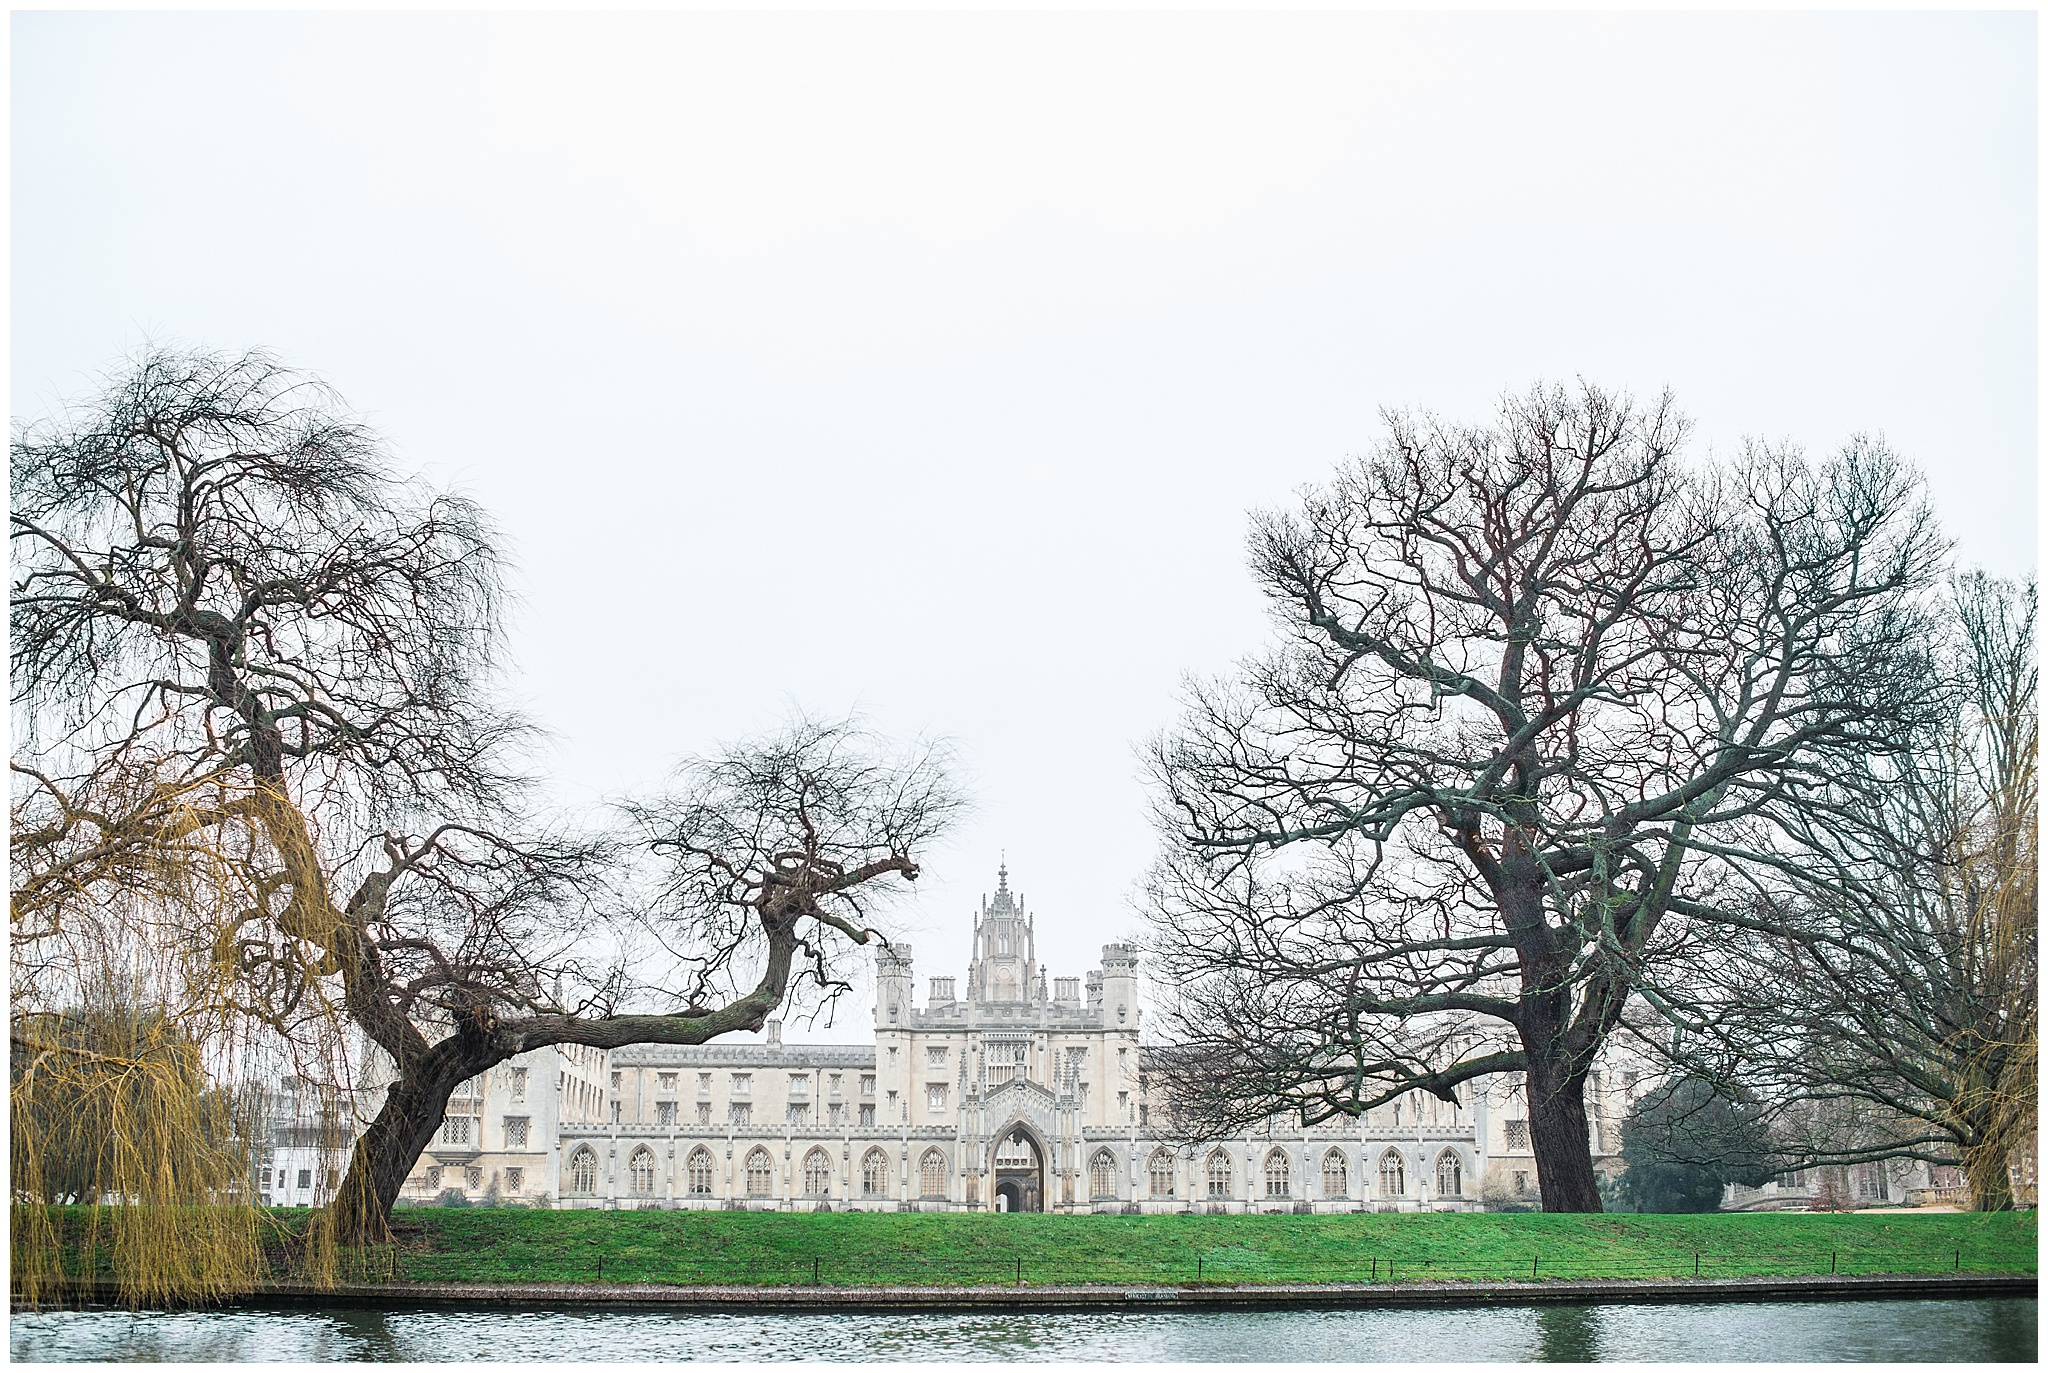 Cambridge_day2_0150.jpg